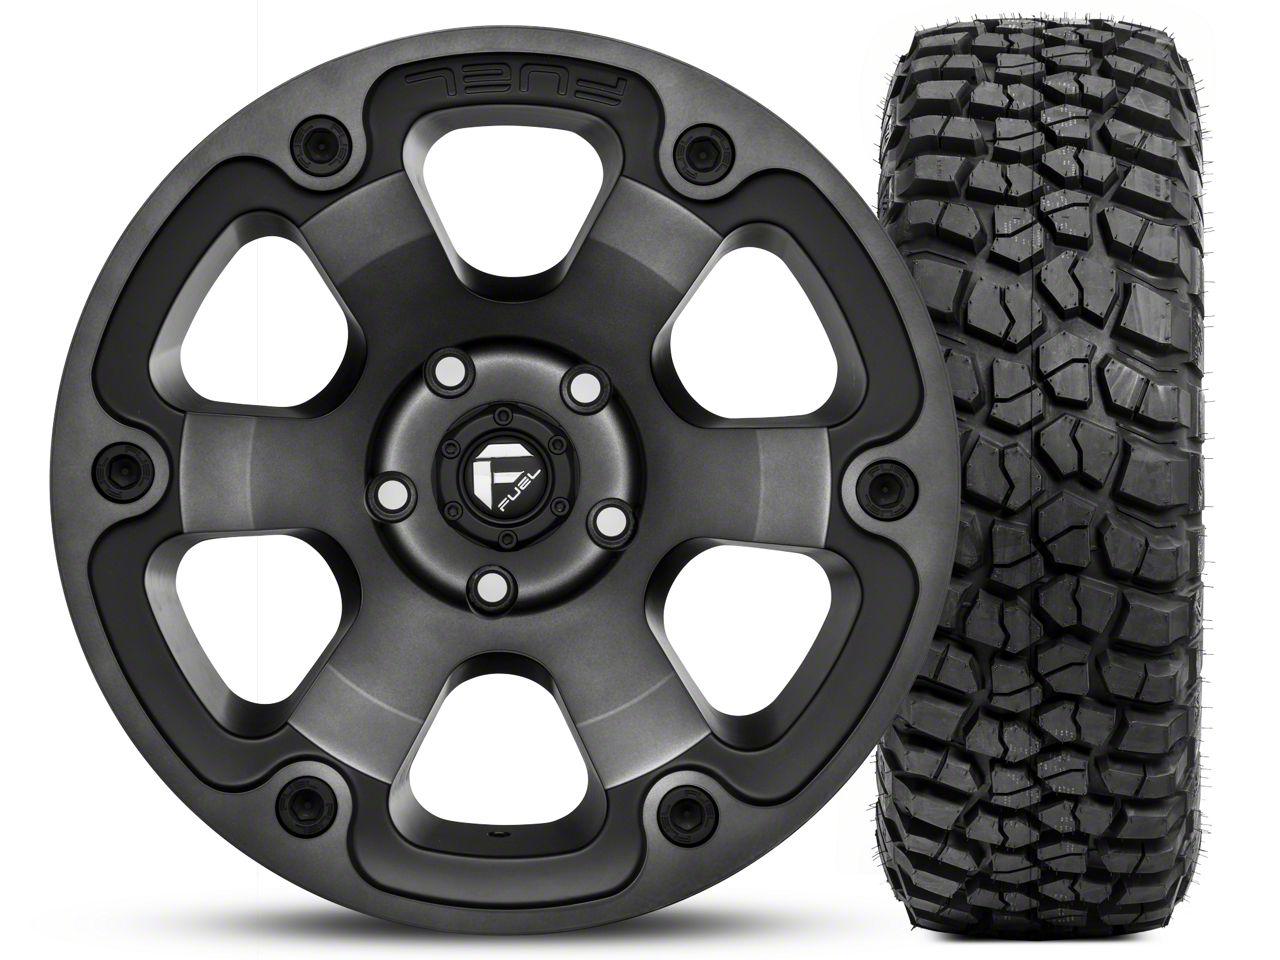 Fuel Wheels Beast Black Machined Wheel 17x9 and BF Goodrich Mud Terrain T/A KM2 265/70R17 Kit (07-18 Jeep Wrangler JK; 2018 Jeep Wrangler JL)